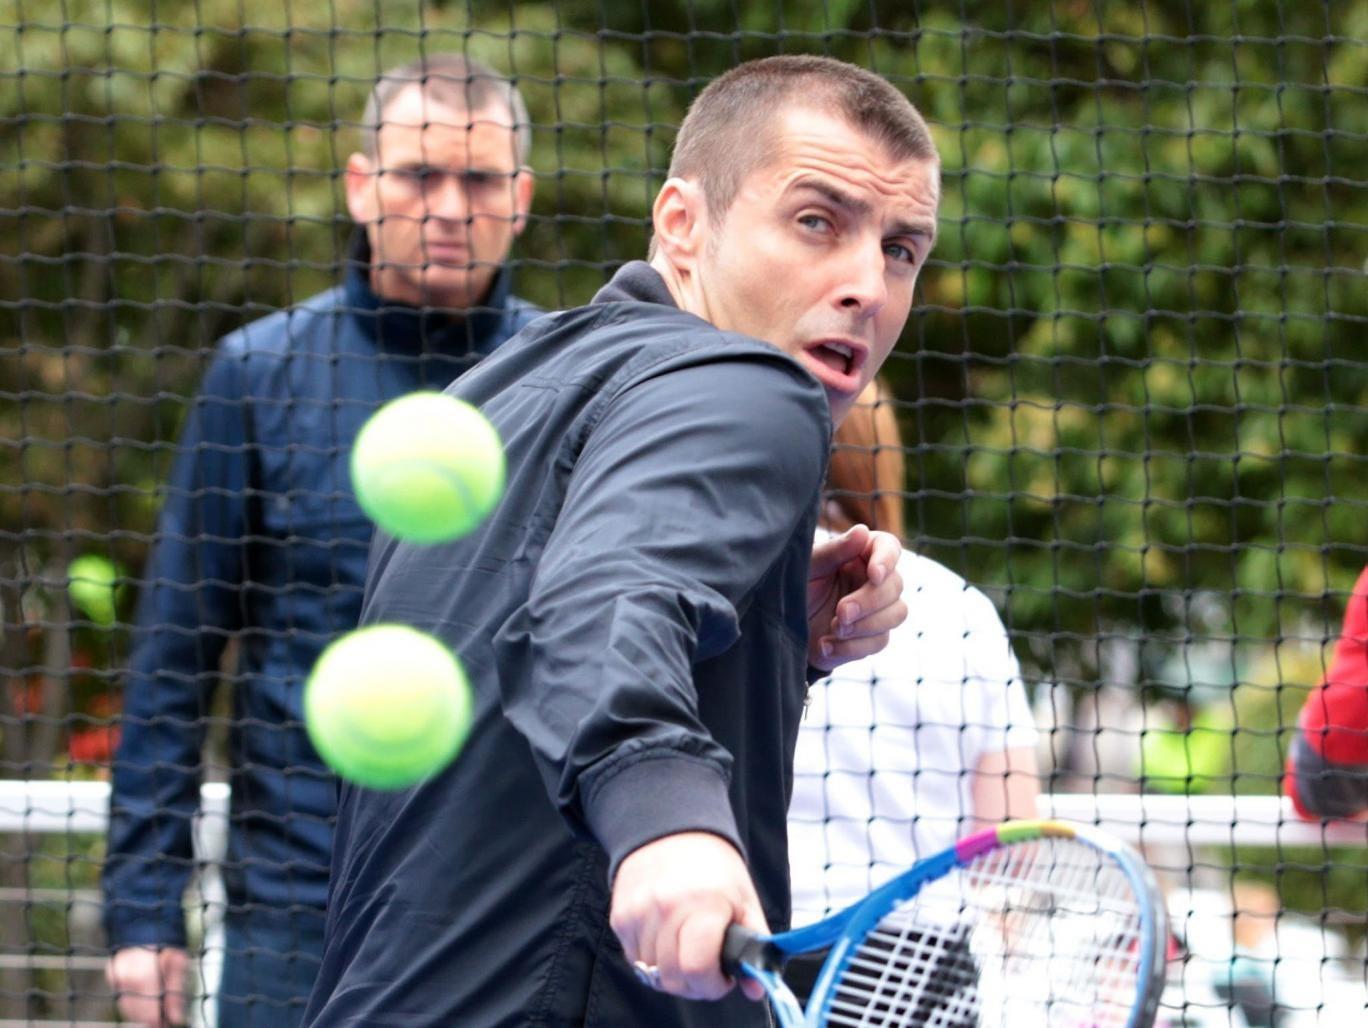 Liam Gallagher battles Aussie Open heatwave with freshly shaved head (and bomber jacket) in bizarre tennis-related PR stunt